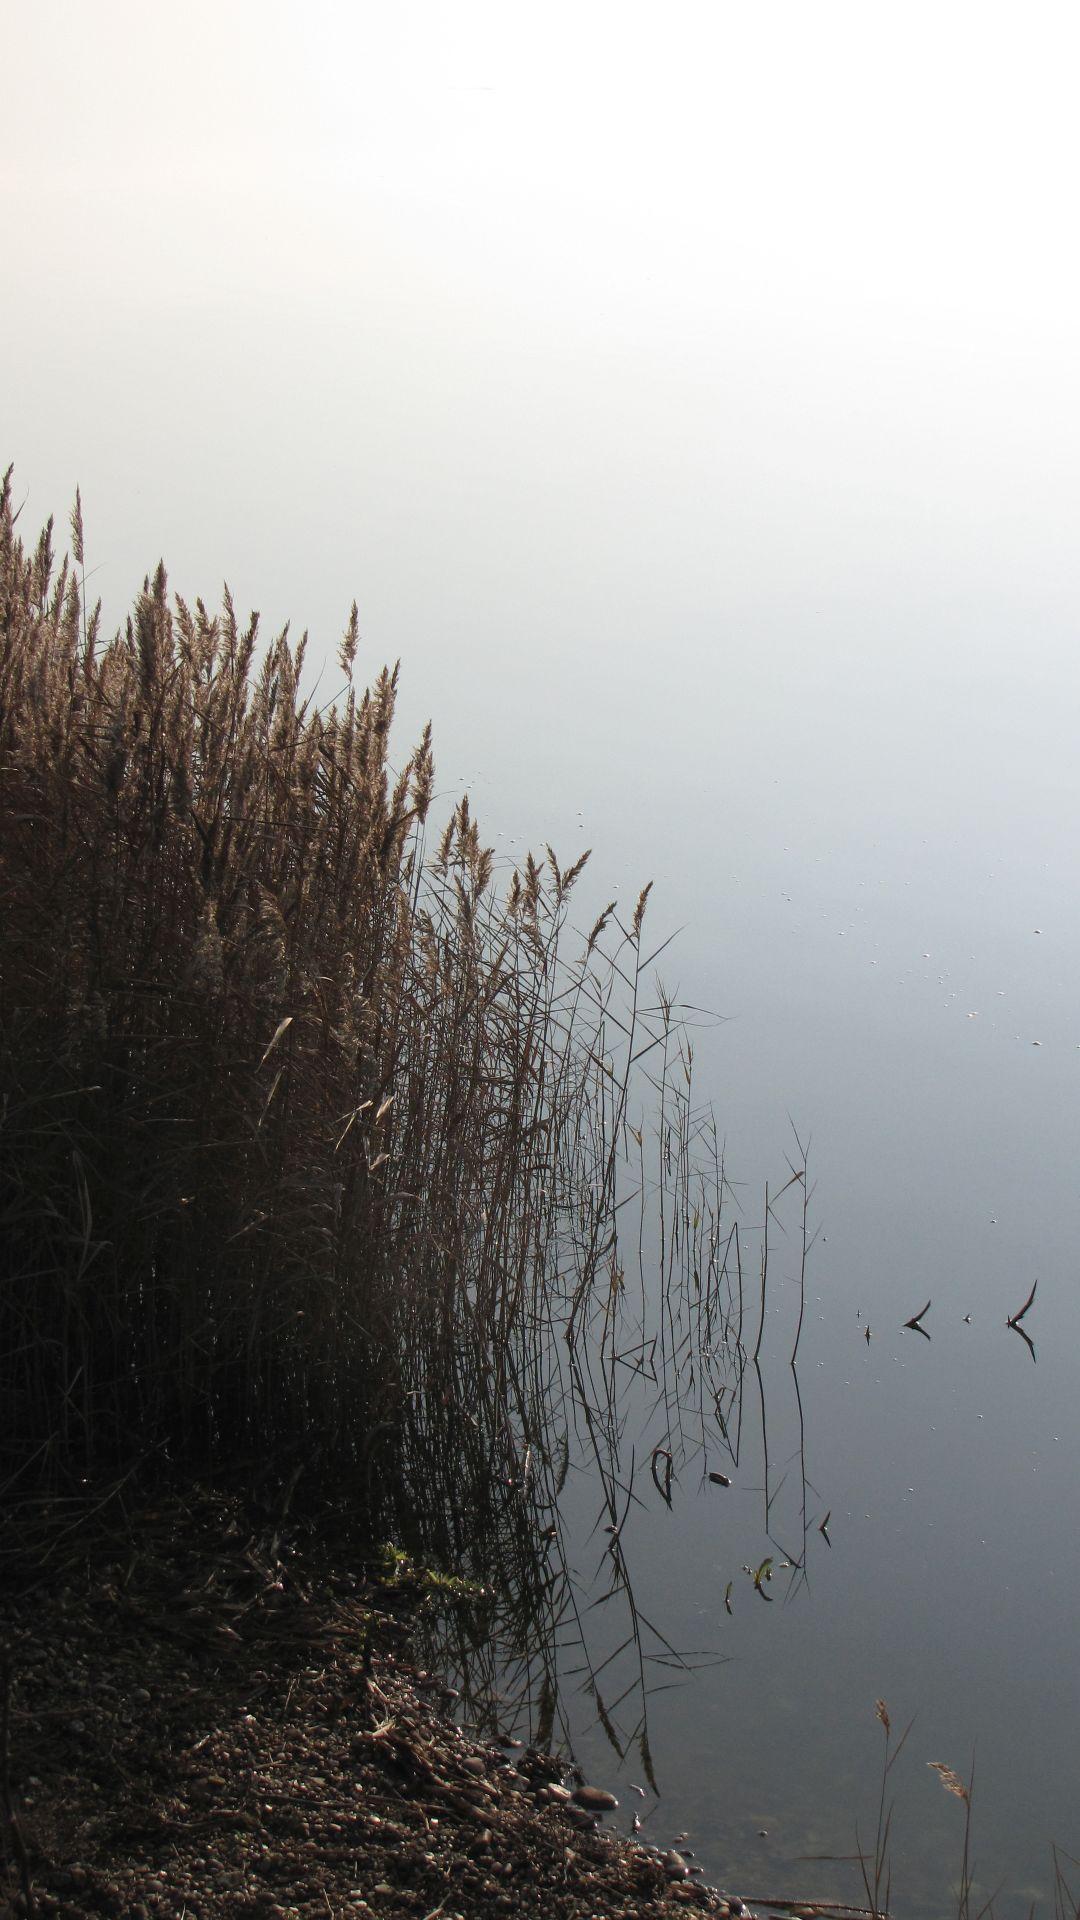 Nr Heybridge Basin, Essex, UK - ... still calm